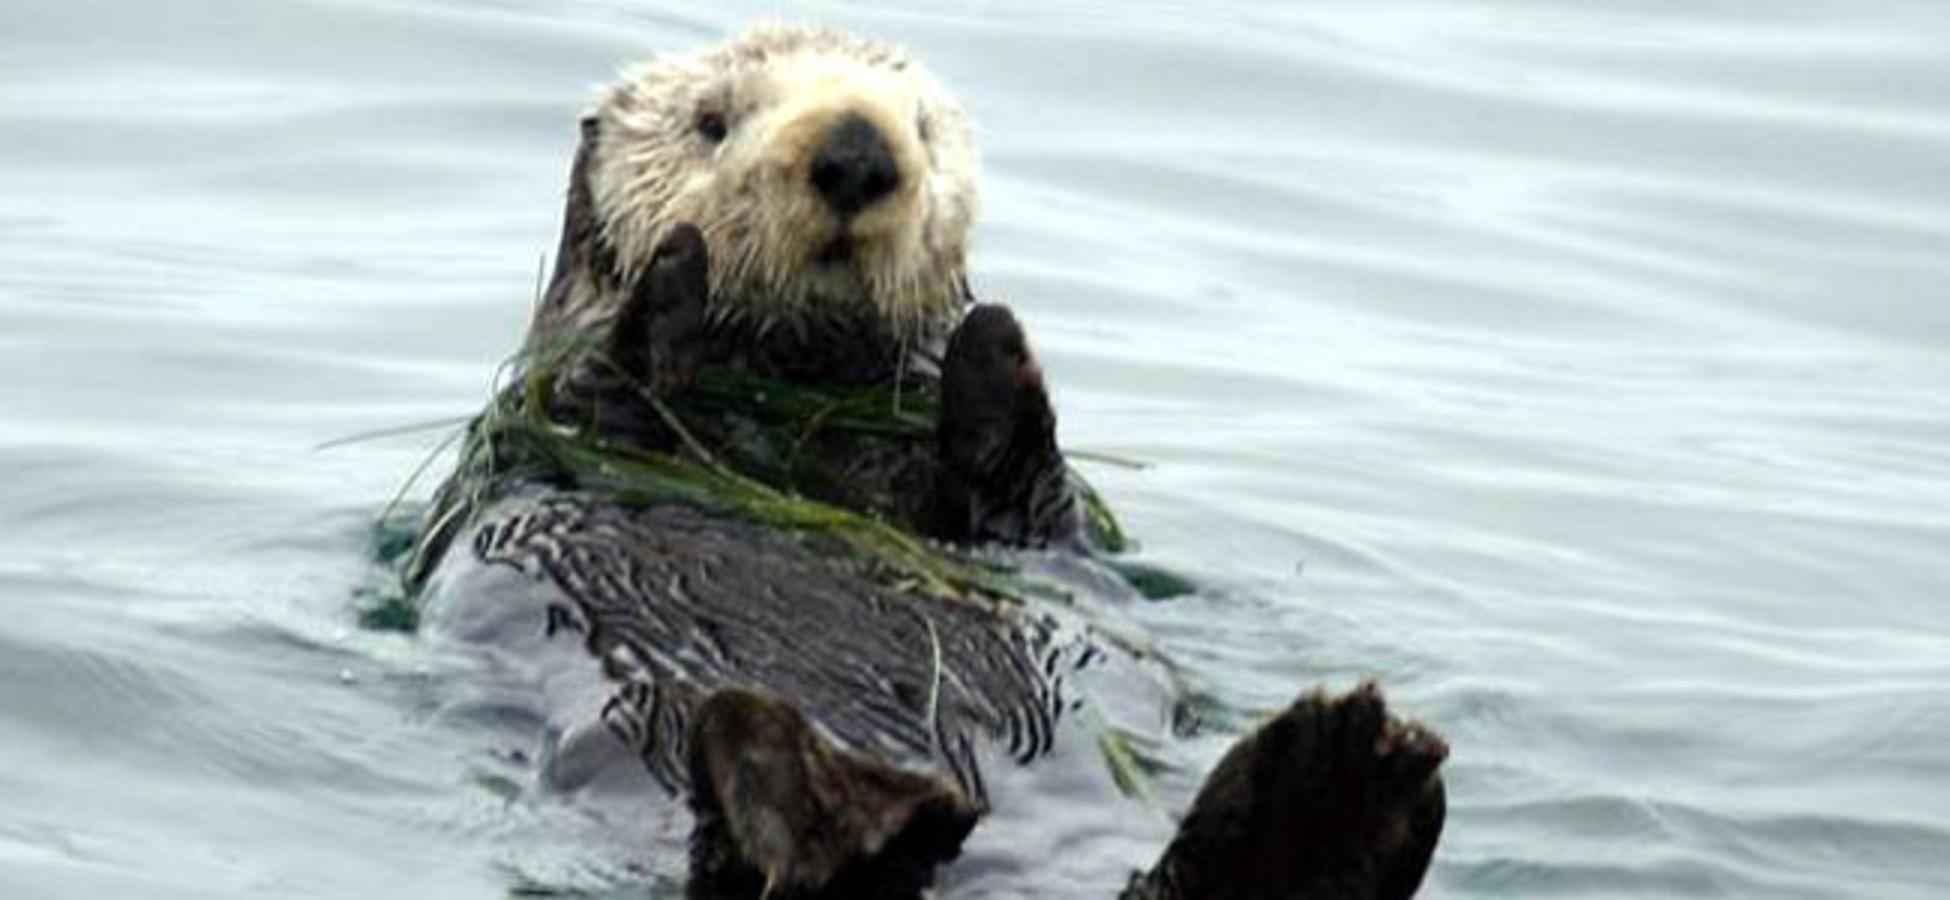 Kostenlose Bild: Meer, Otter, Tier, enhydra lutris, enhydra lutris ...